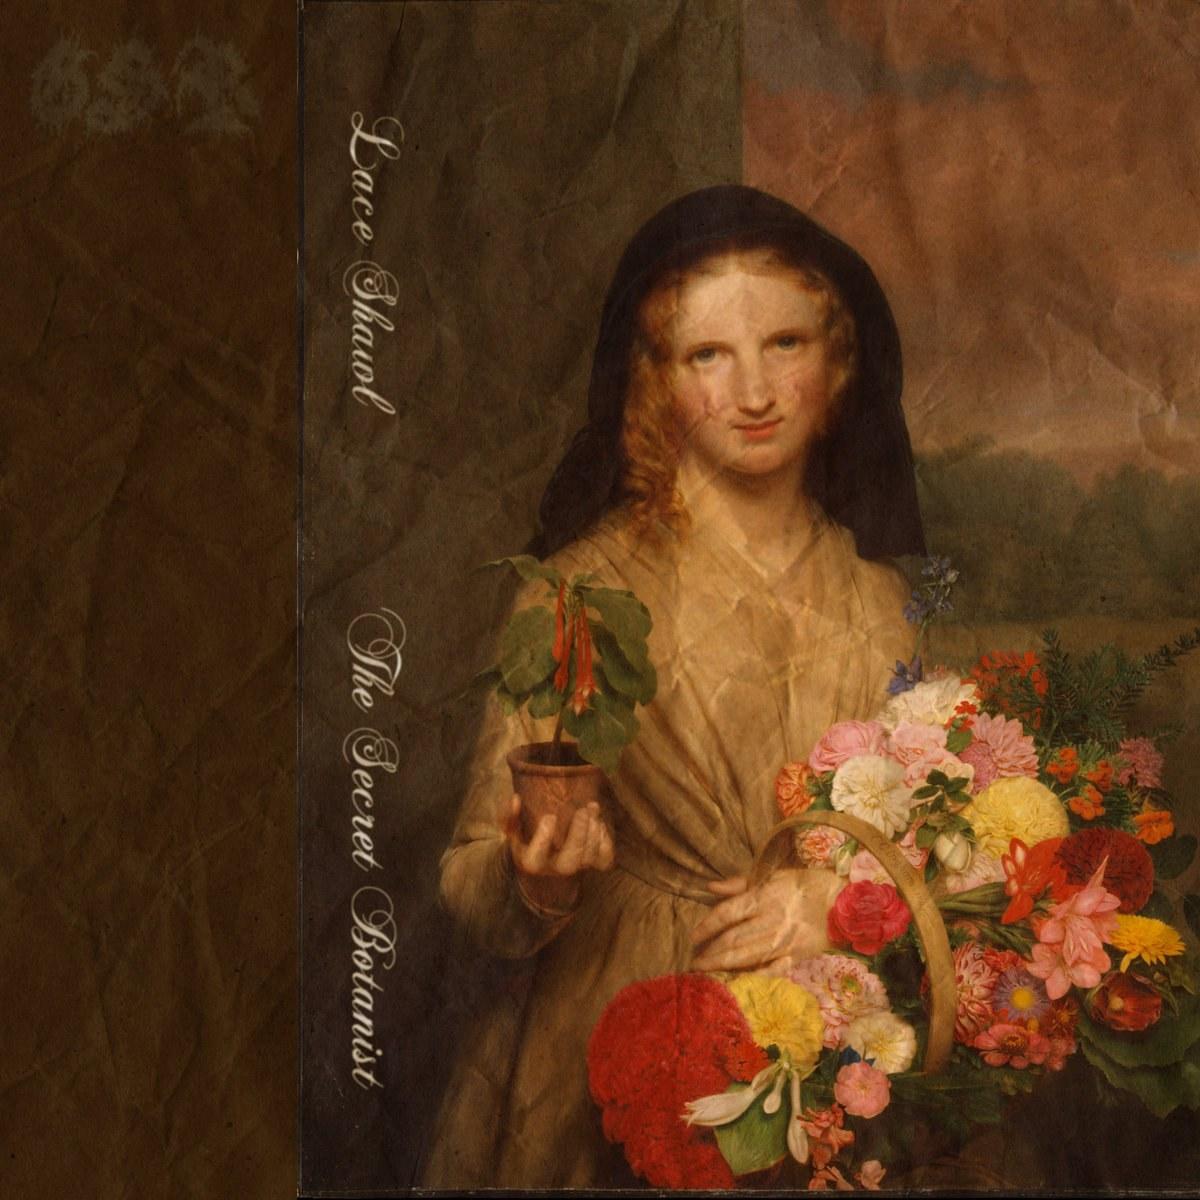 Reviews for Lace Shawl - The Secret Botanist